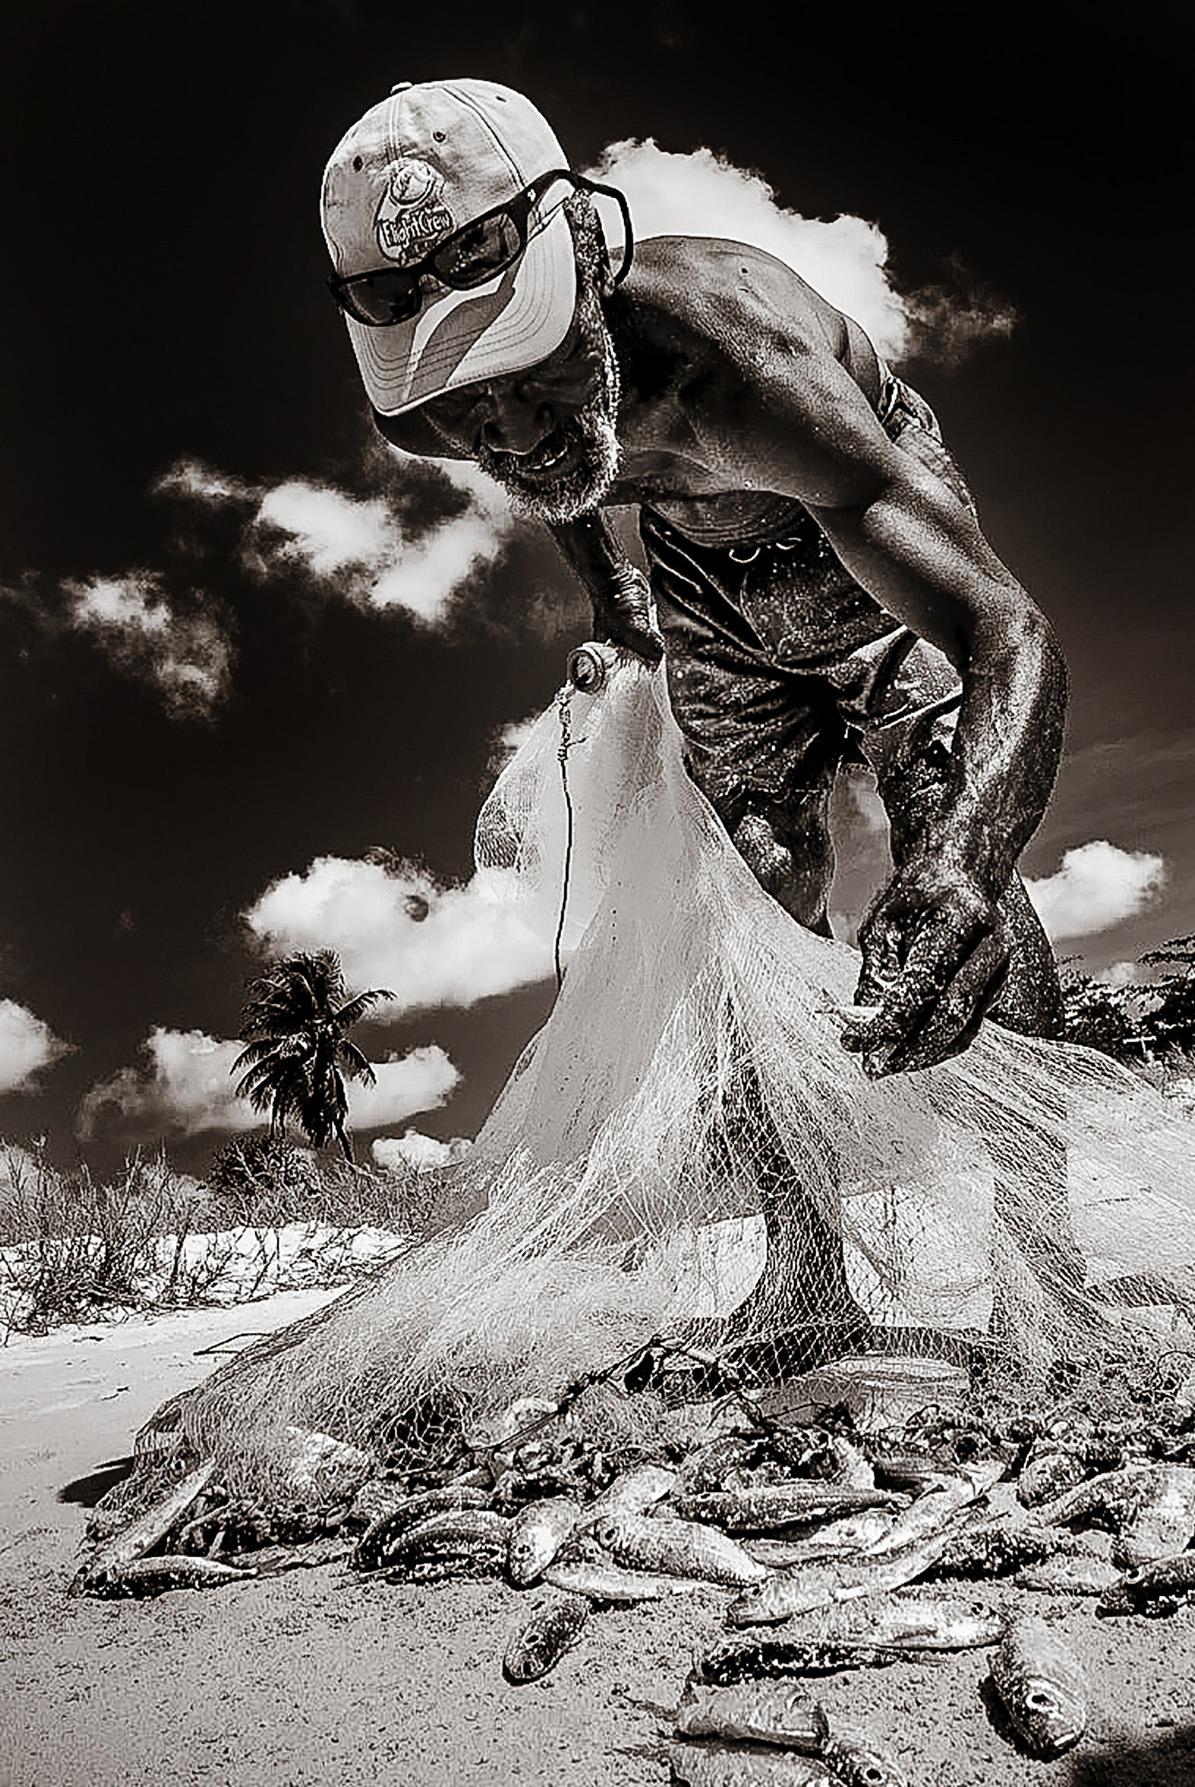 Foto: Eric Berger Nikon D5000 f11 1/500 Bridgetown/Barbados